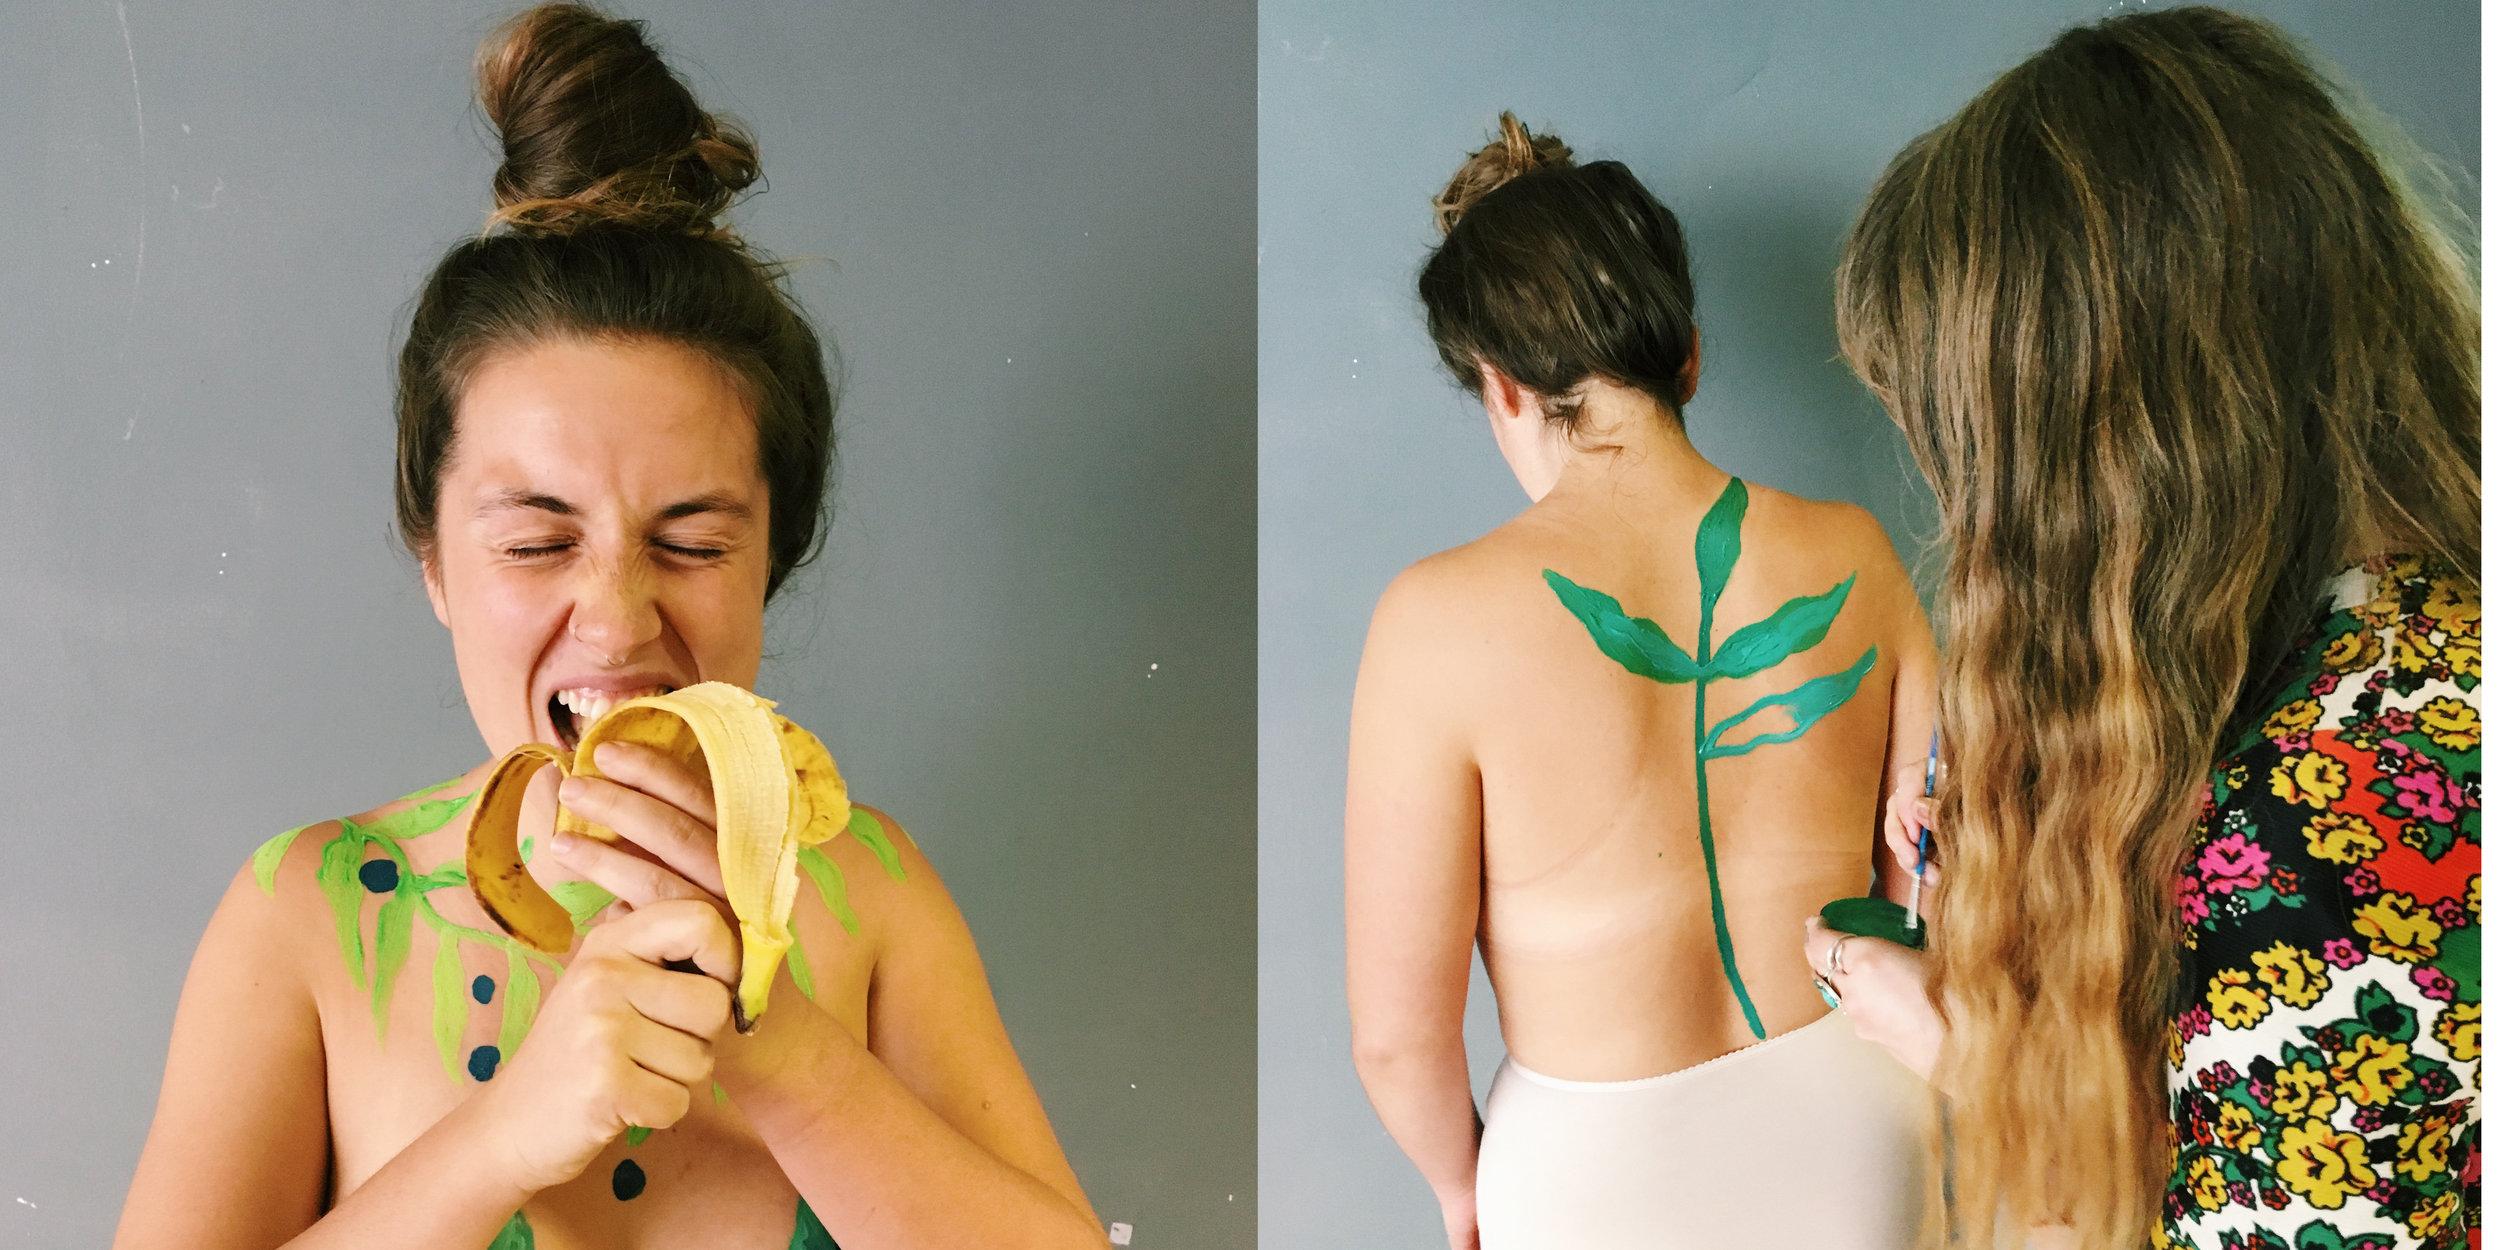 Follow on INSTAGRAM  @KERRYARDEN  AND BODY ART BY  @IZZYWILLIAMSONPRINTS